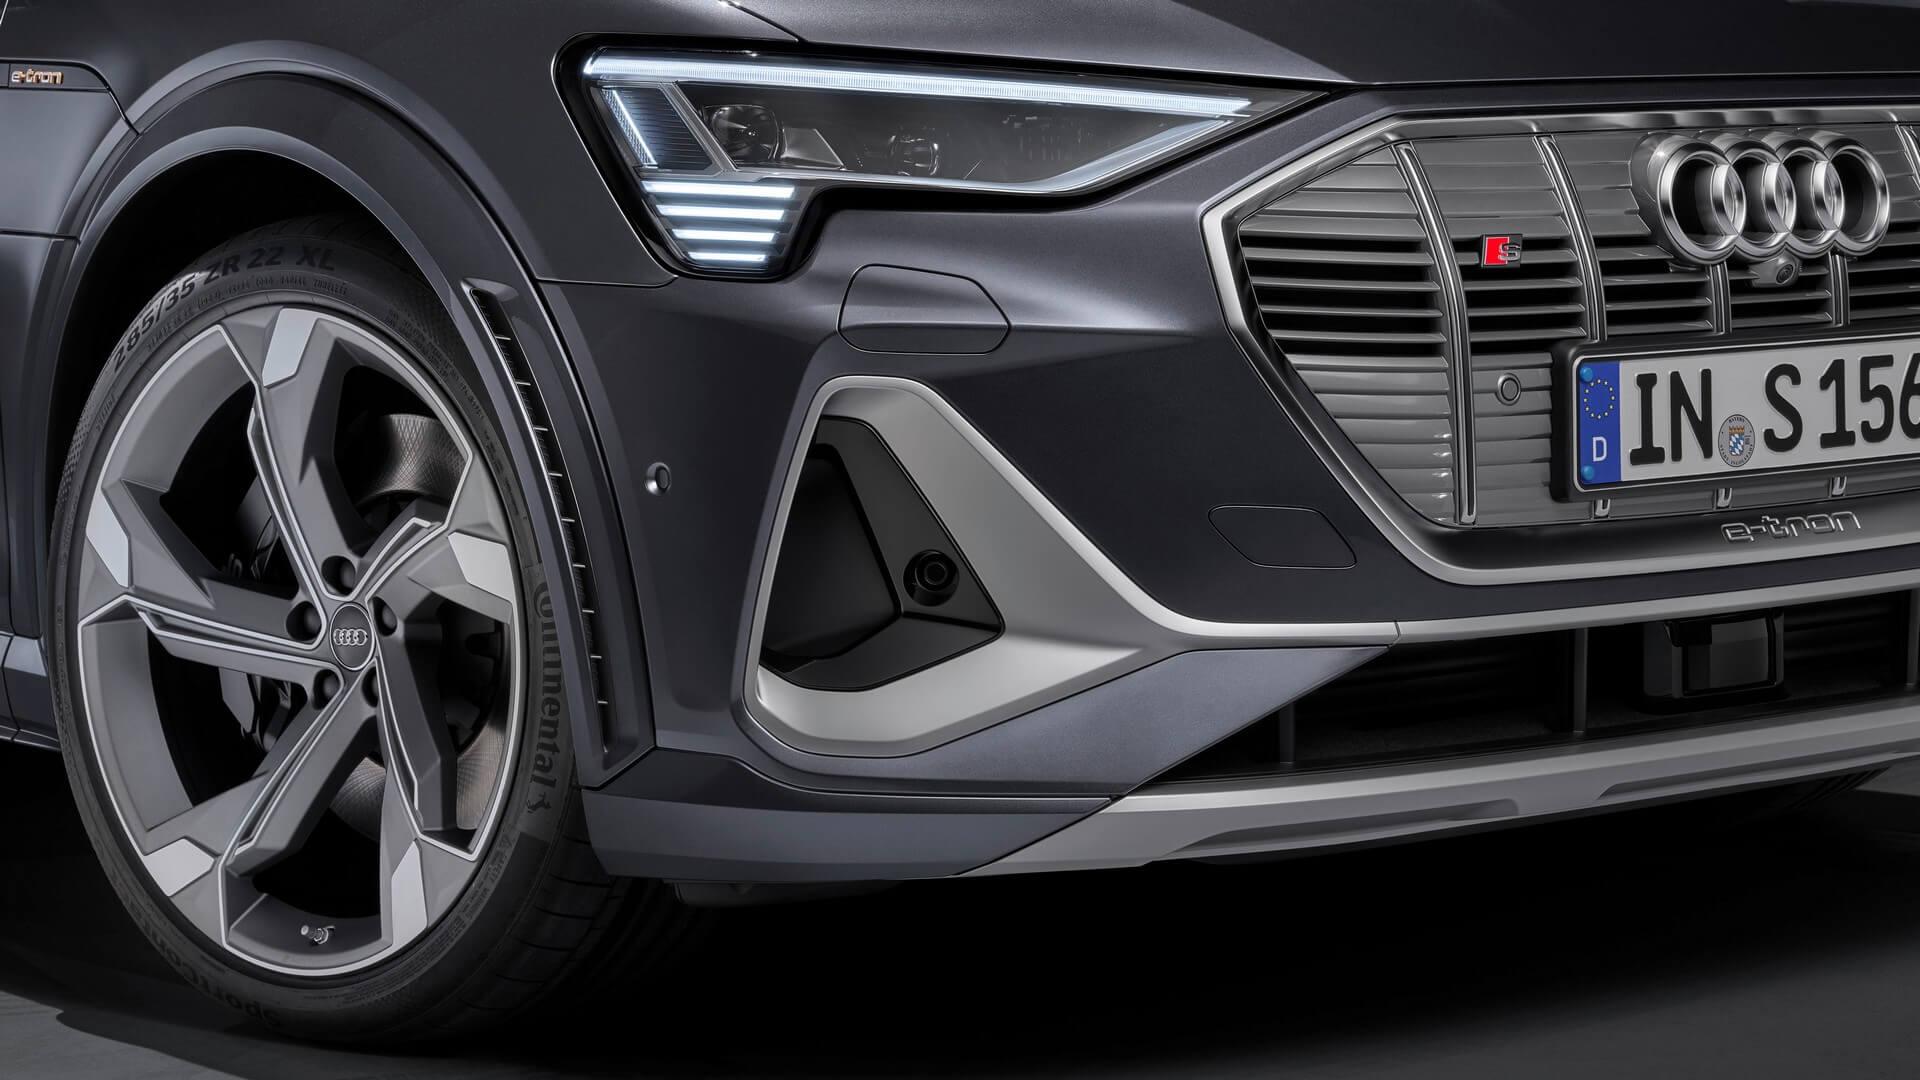 Audi-E-Tron-S-and-E-Tron-S-Sportback-2020-91